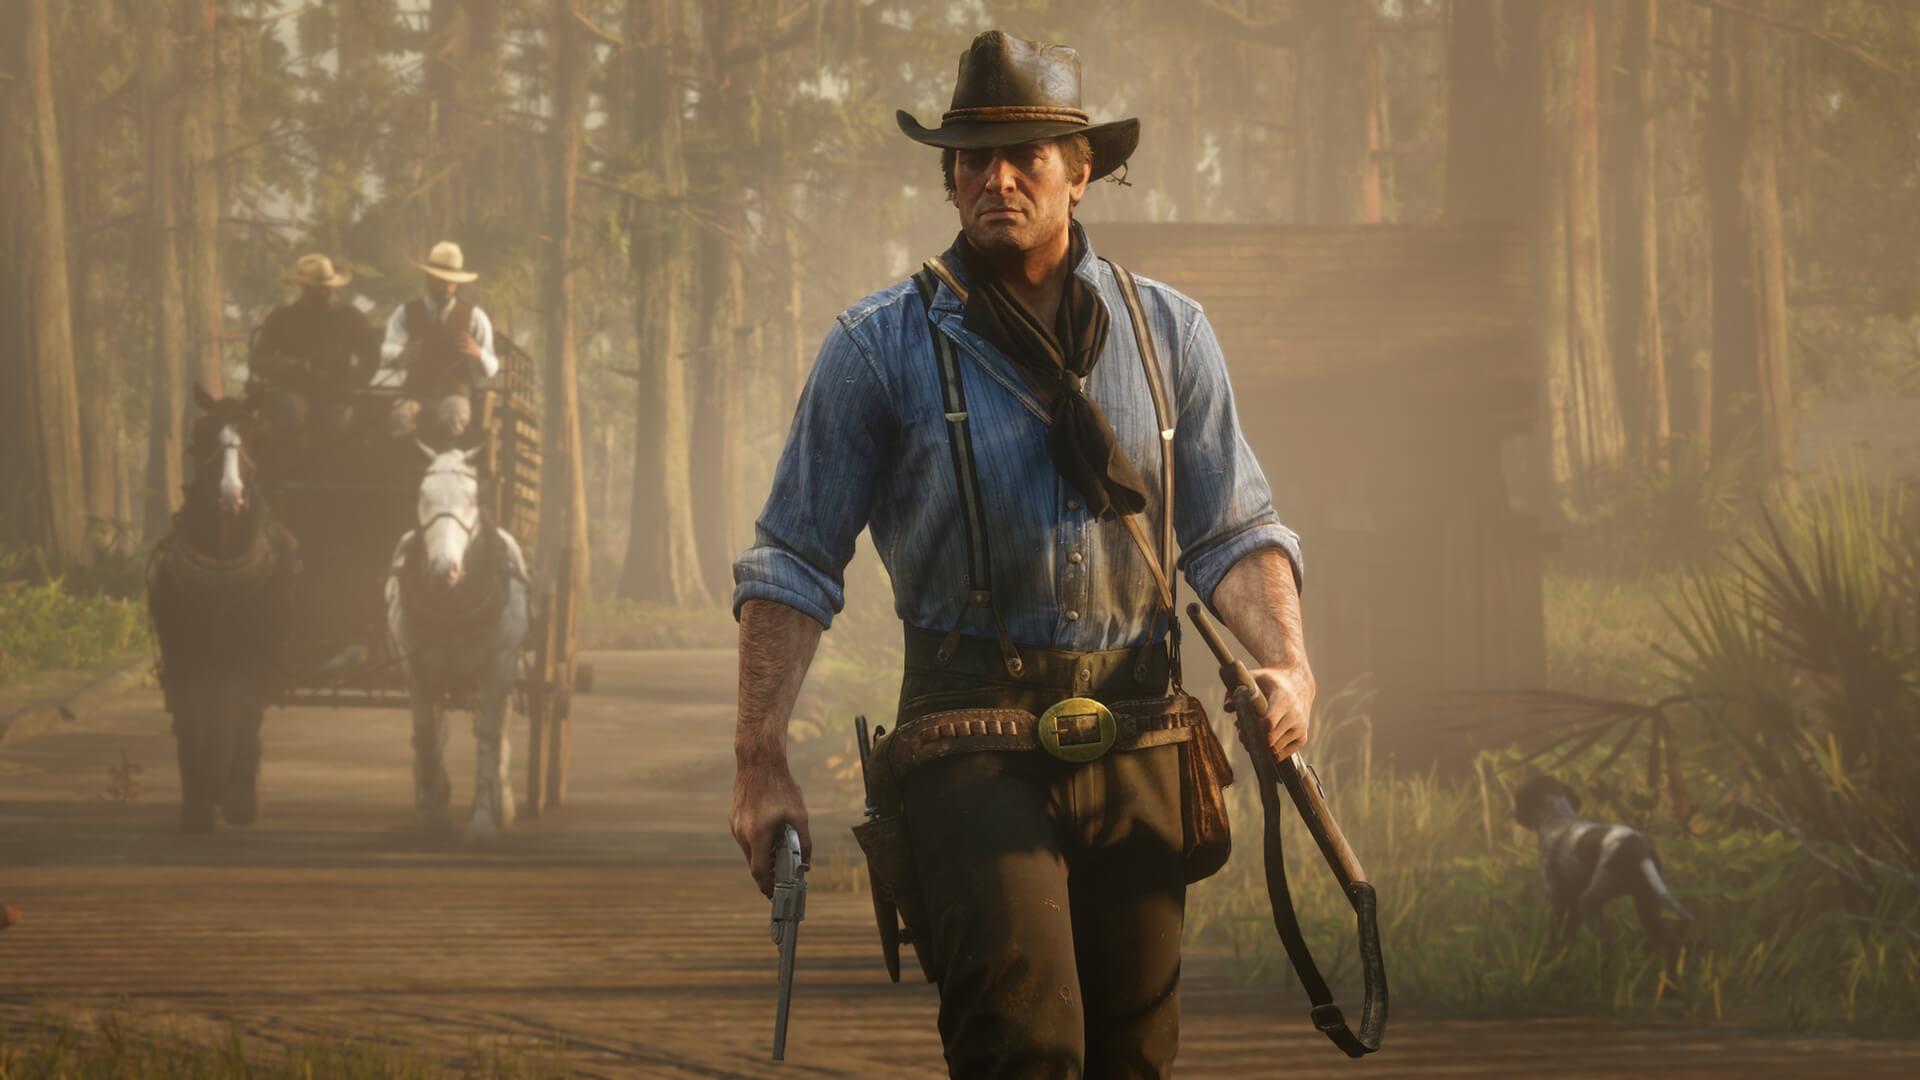 Red Dead Redemption 2 Download PC - Full Game Crack for Free - CrackGods